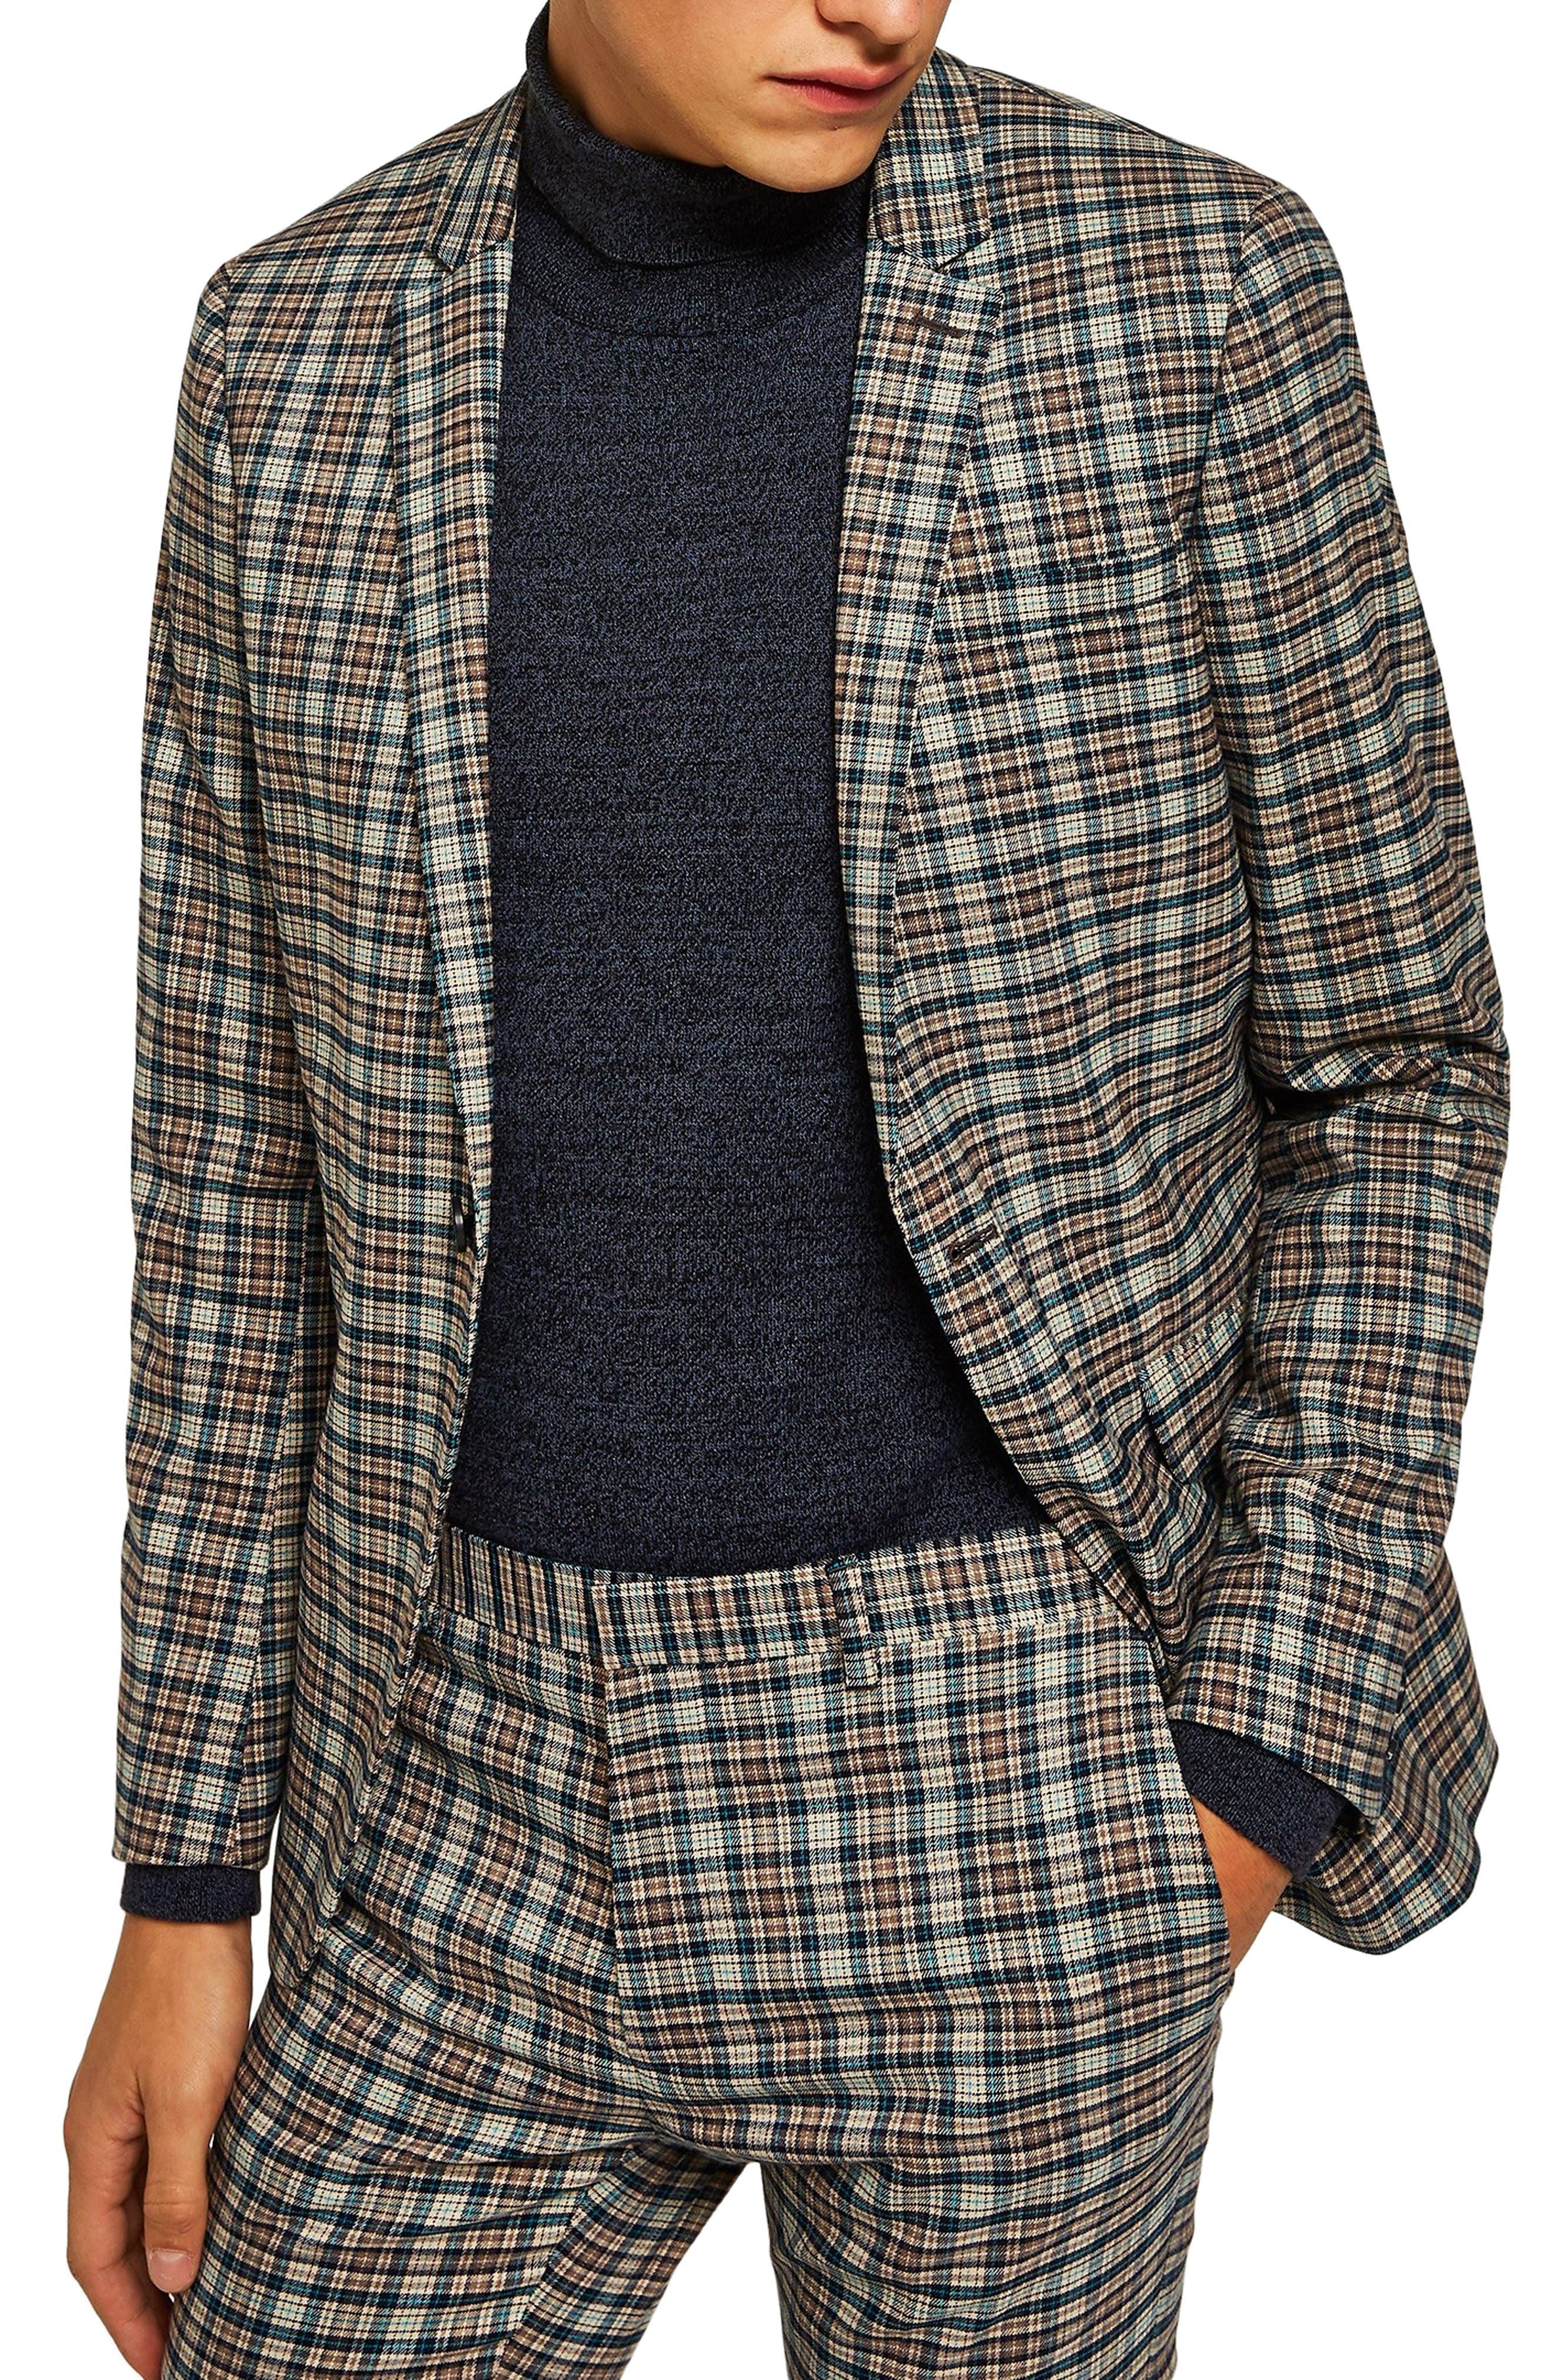 Ultra Skinny Fit Check Suit Jacket,                         Main,                         color, BLACK MULTI